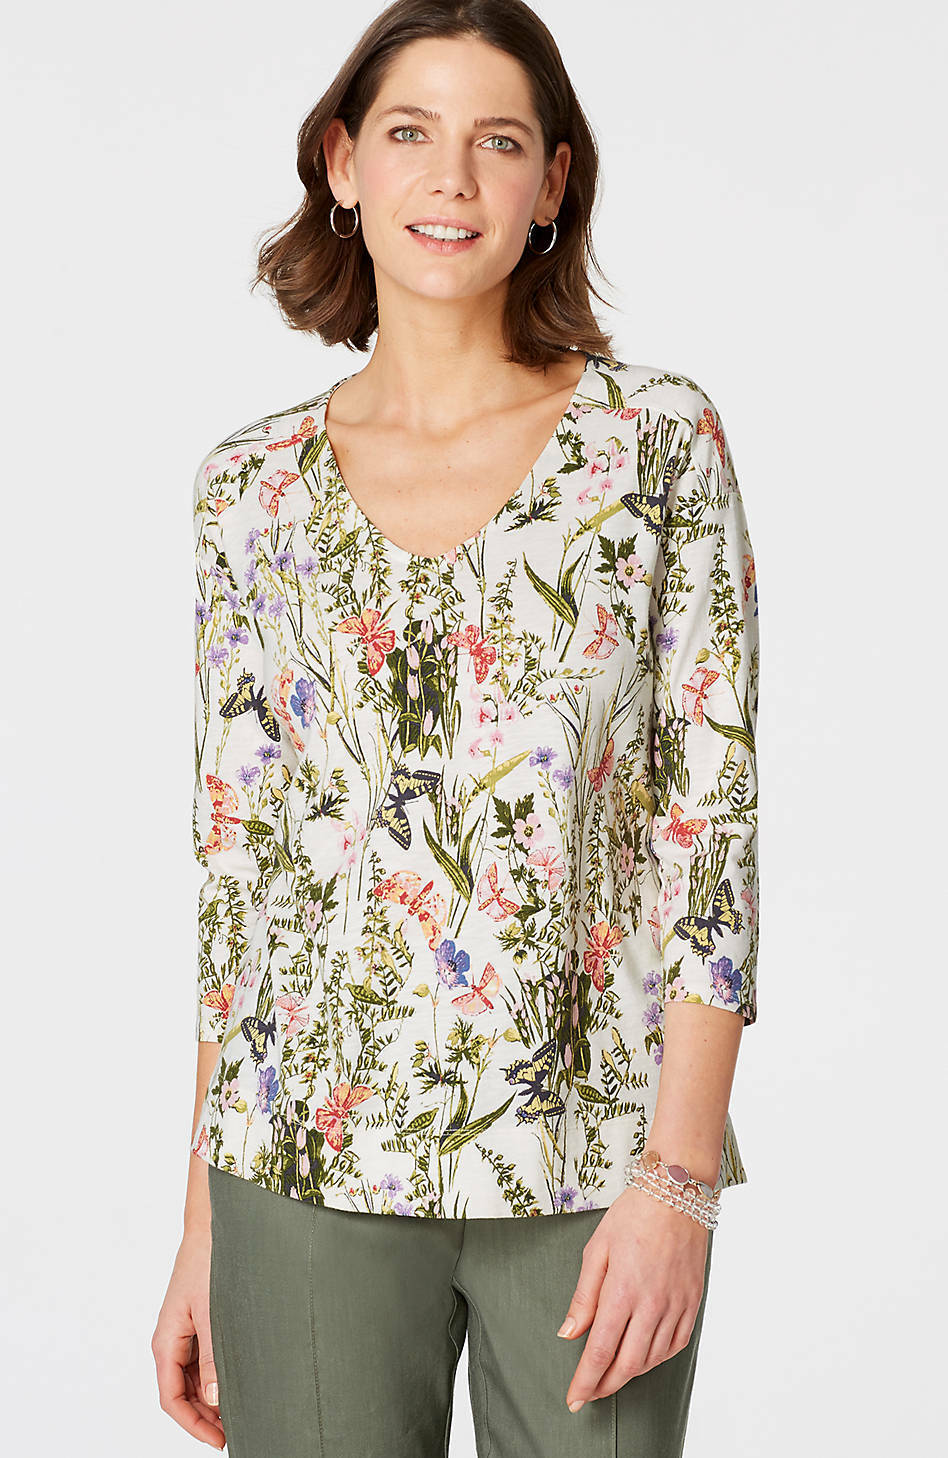 J. Jill - 3X(Plus) - Beautiful Cream Butterfly Garden V-Neck Knit Top - NWT